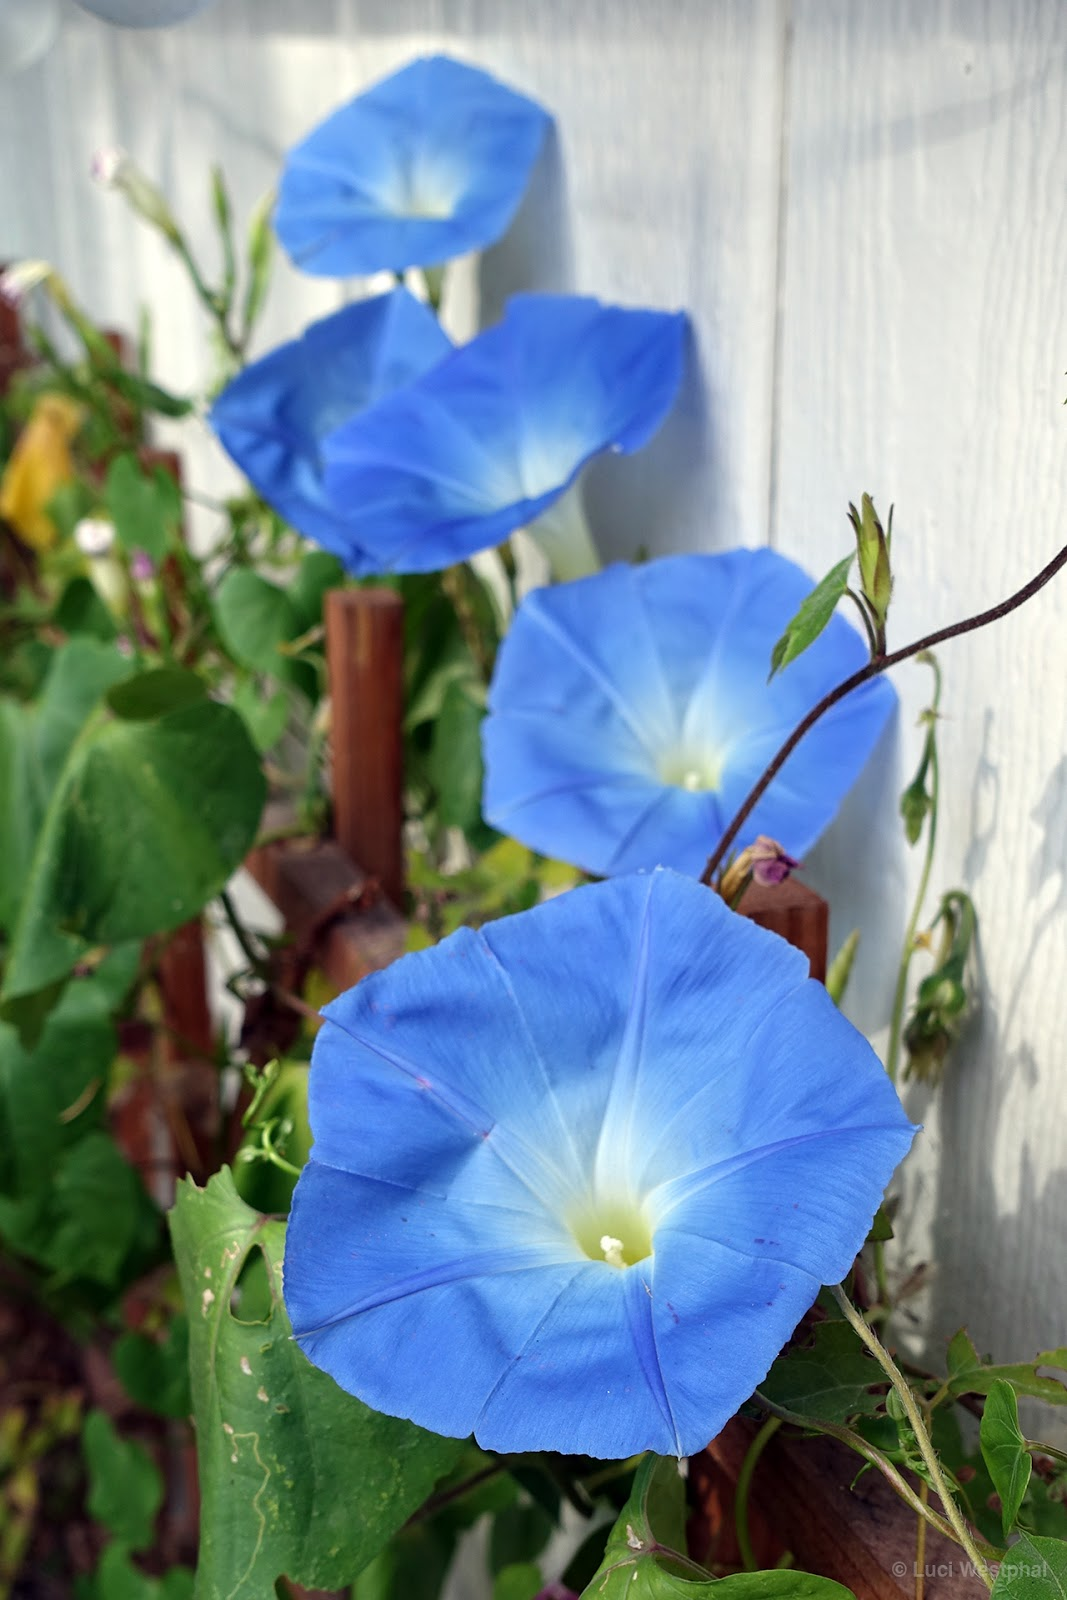 on morning glory in the meantime moonflower in full bloom 1 2 morning ...